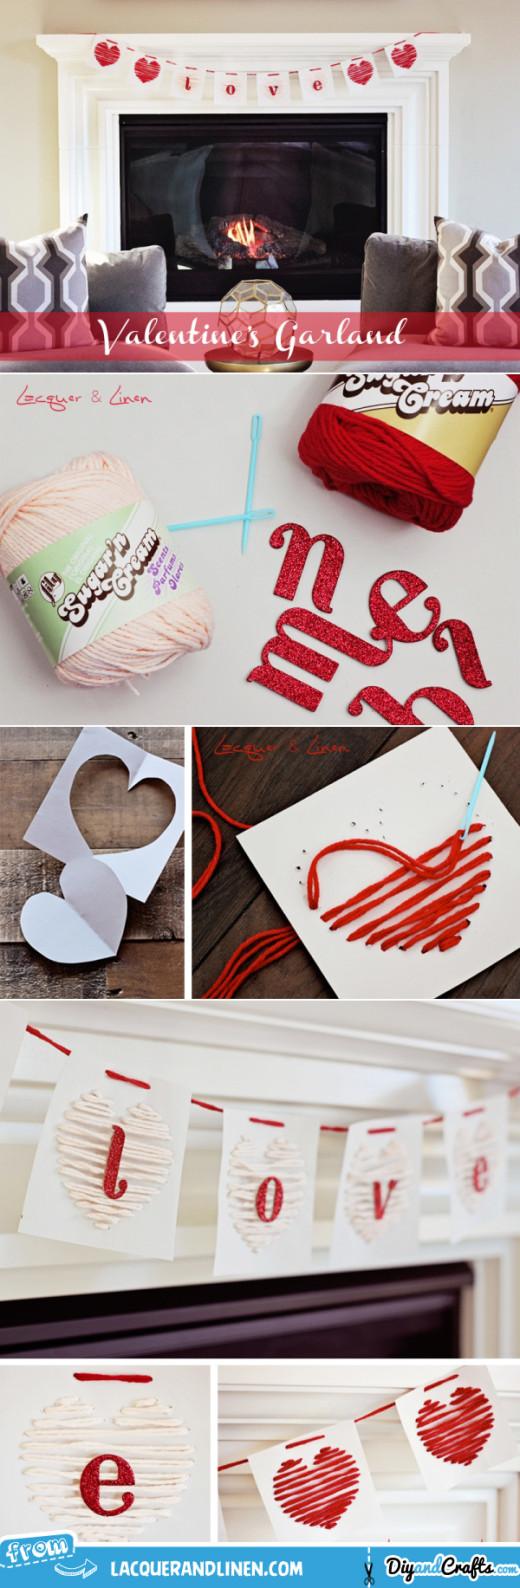 DIY: Yarn Heart Garland | Valentines Day Ideas